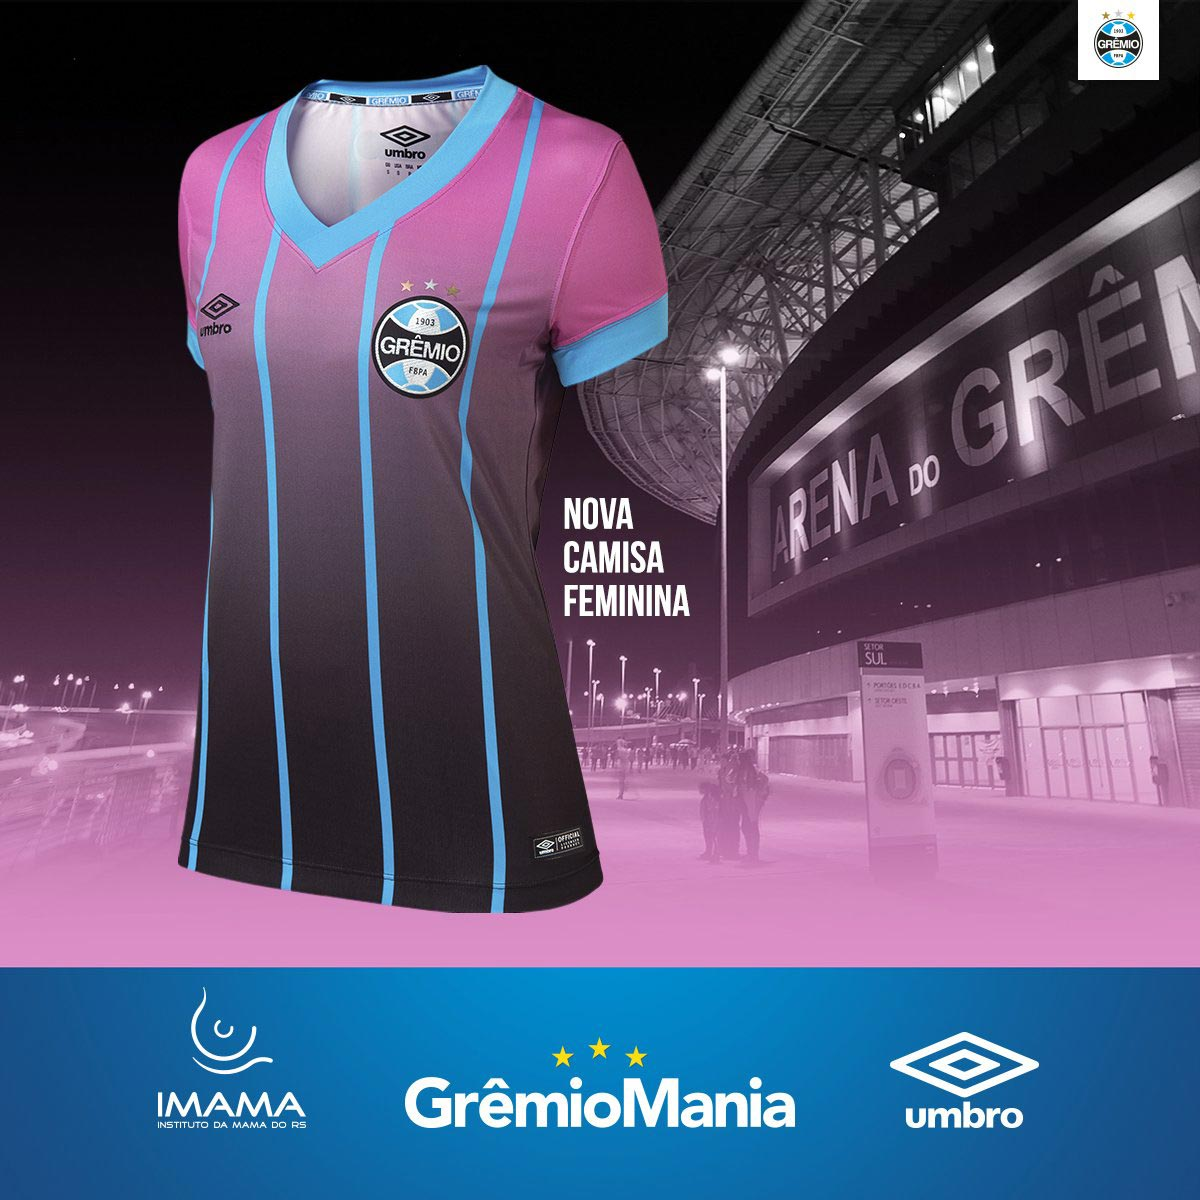 umbro-gremio-pink-october-jersey-banner